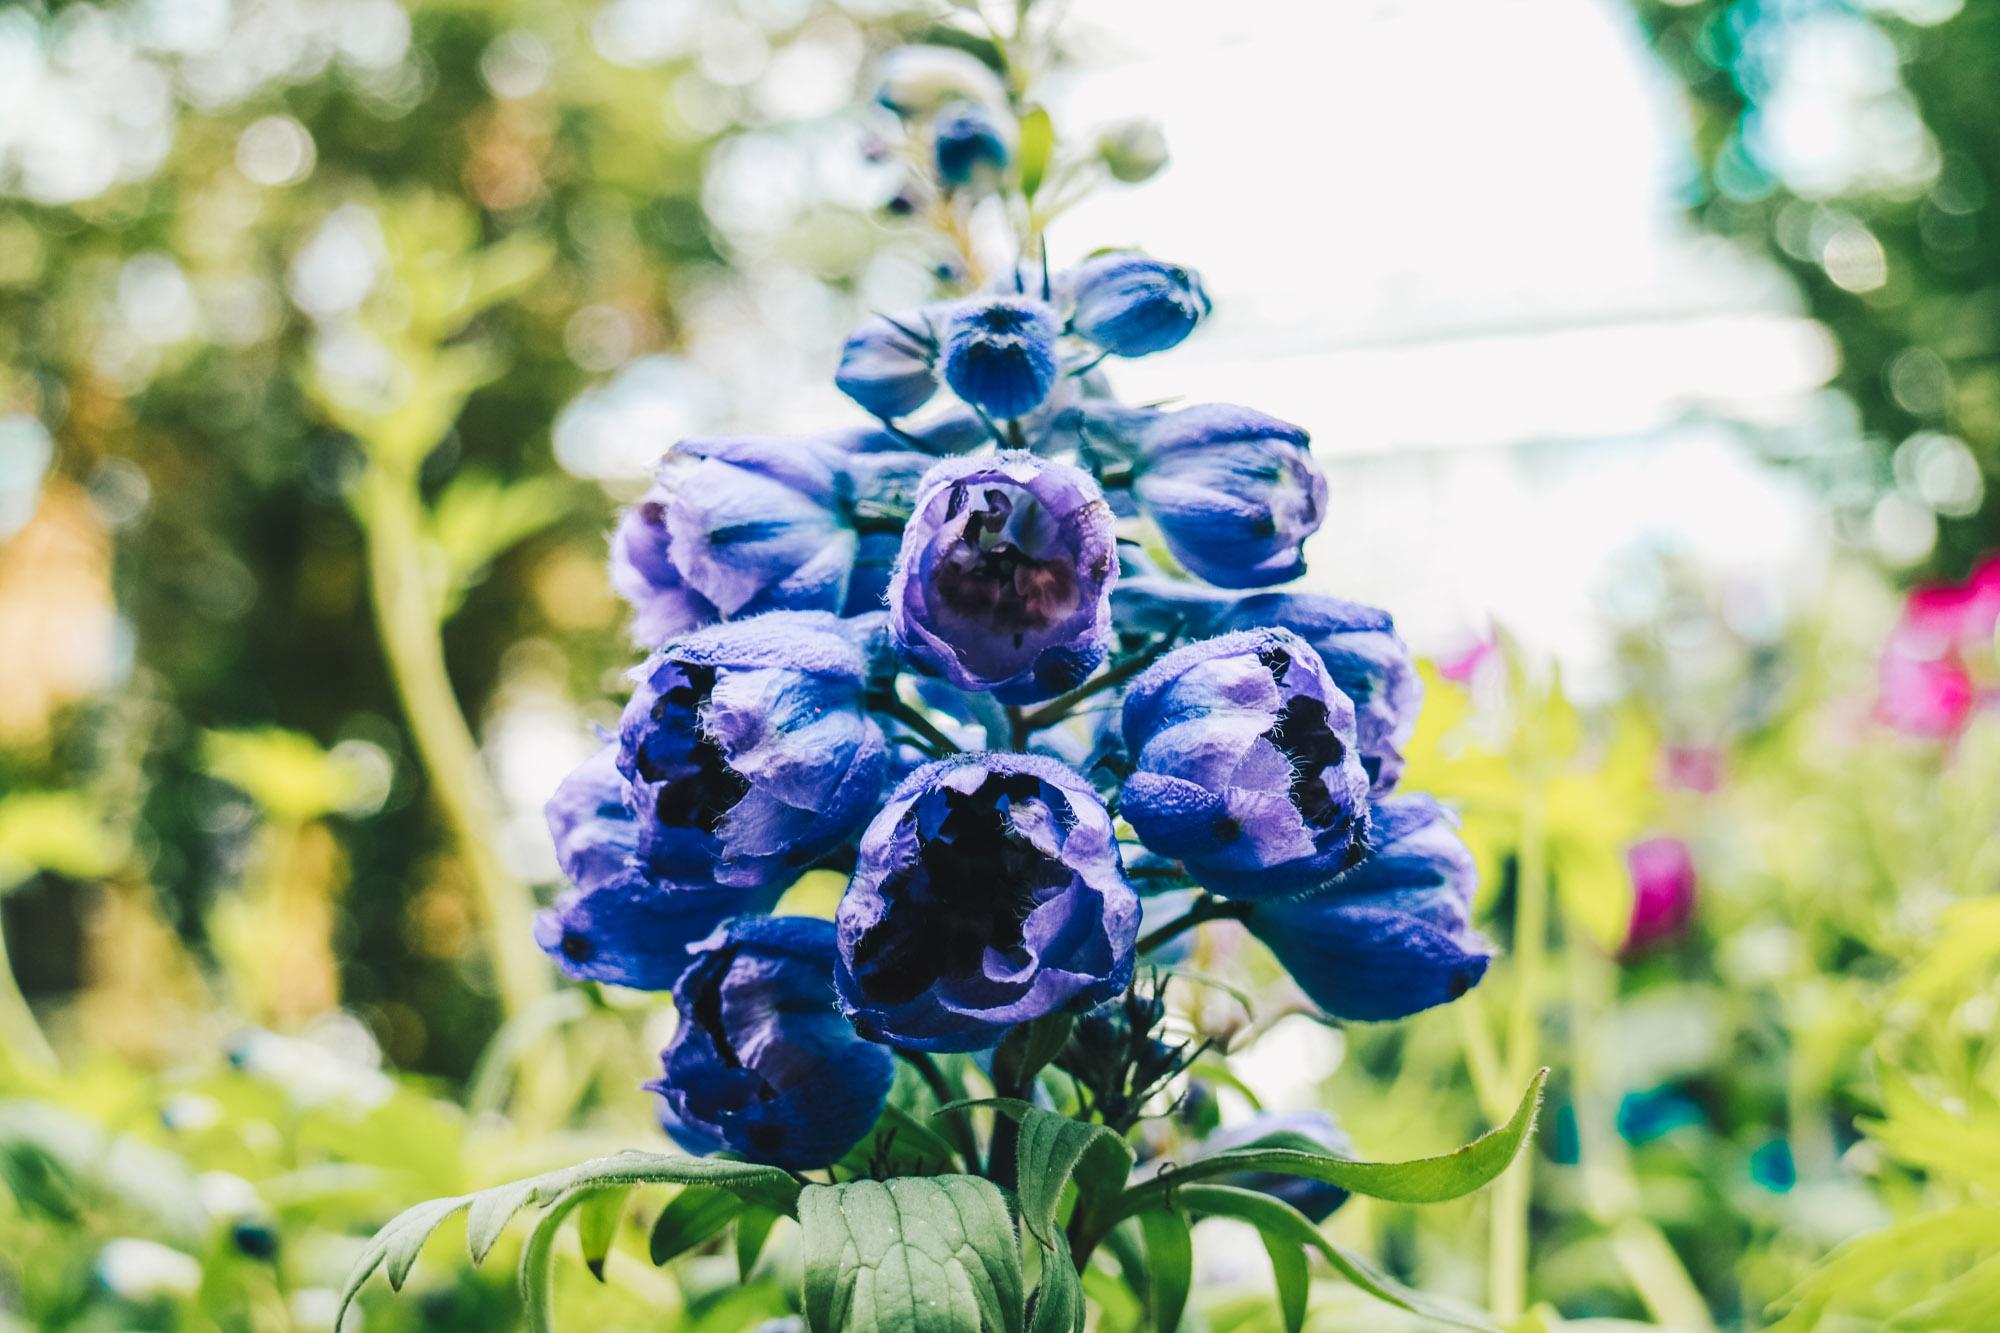 Blue-beauties-floral-display-gardensbythebay-darrenbloggie7